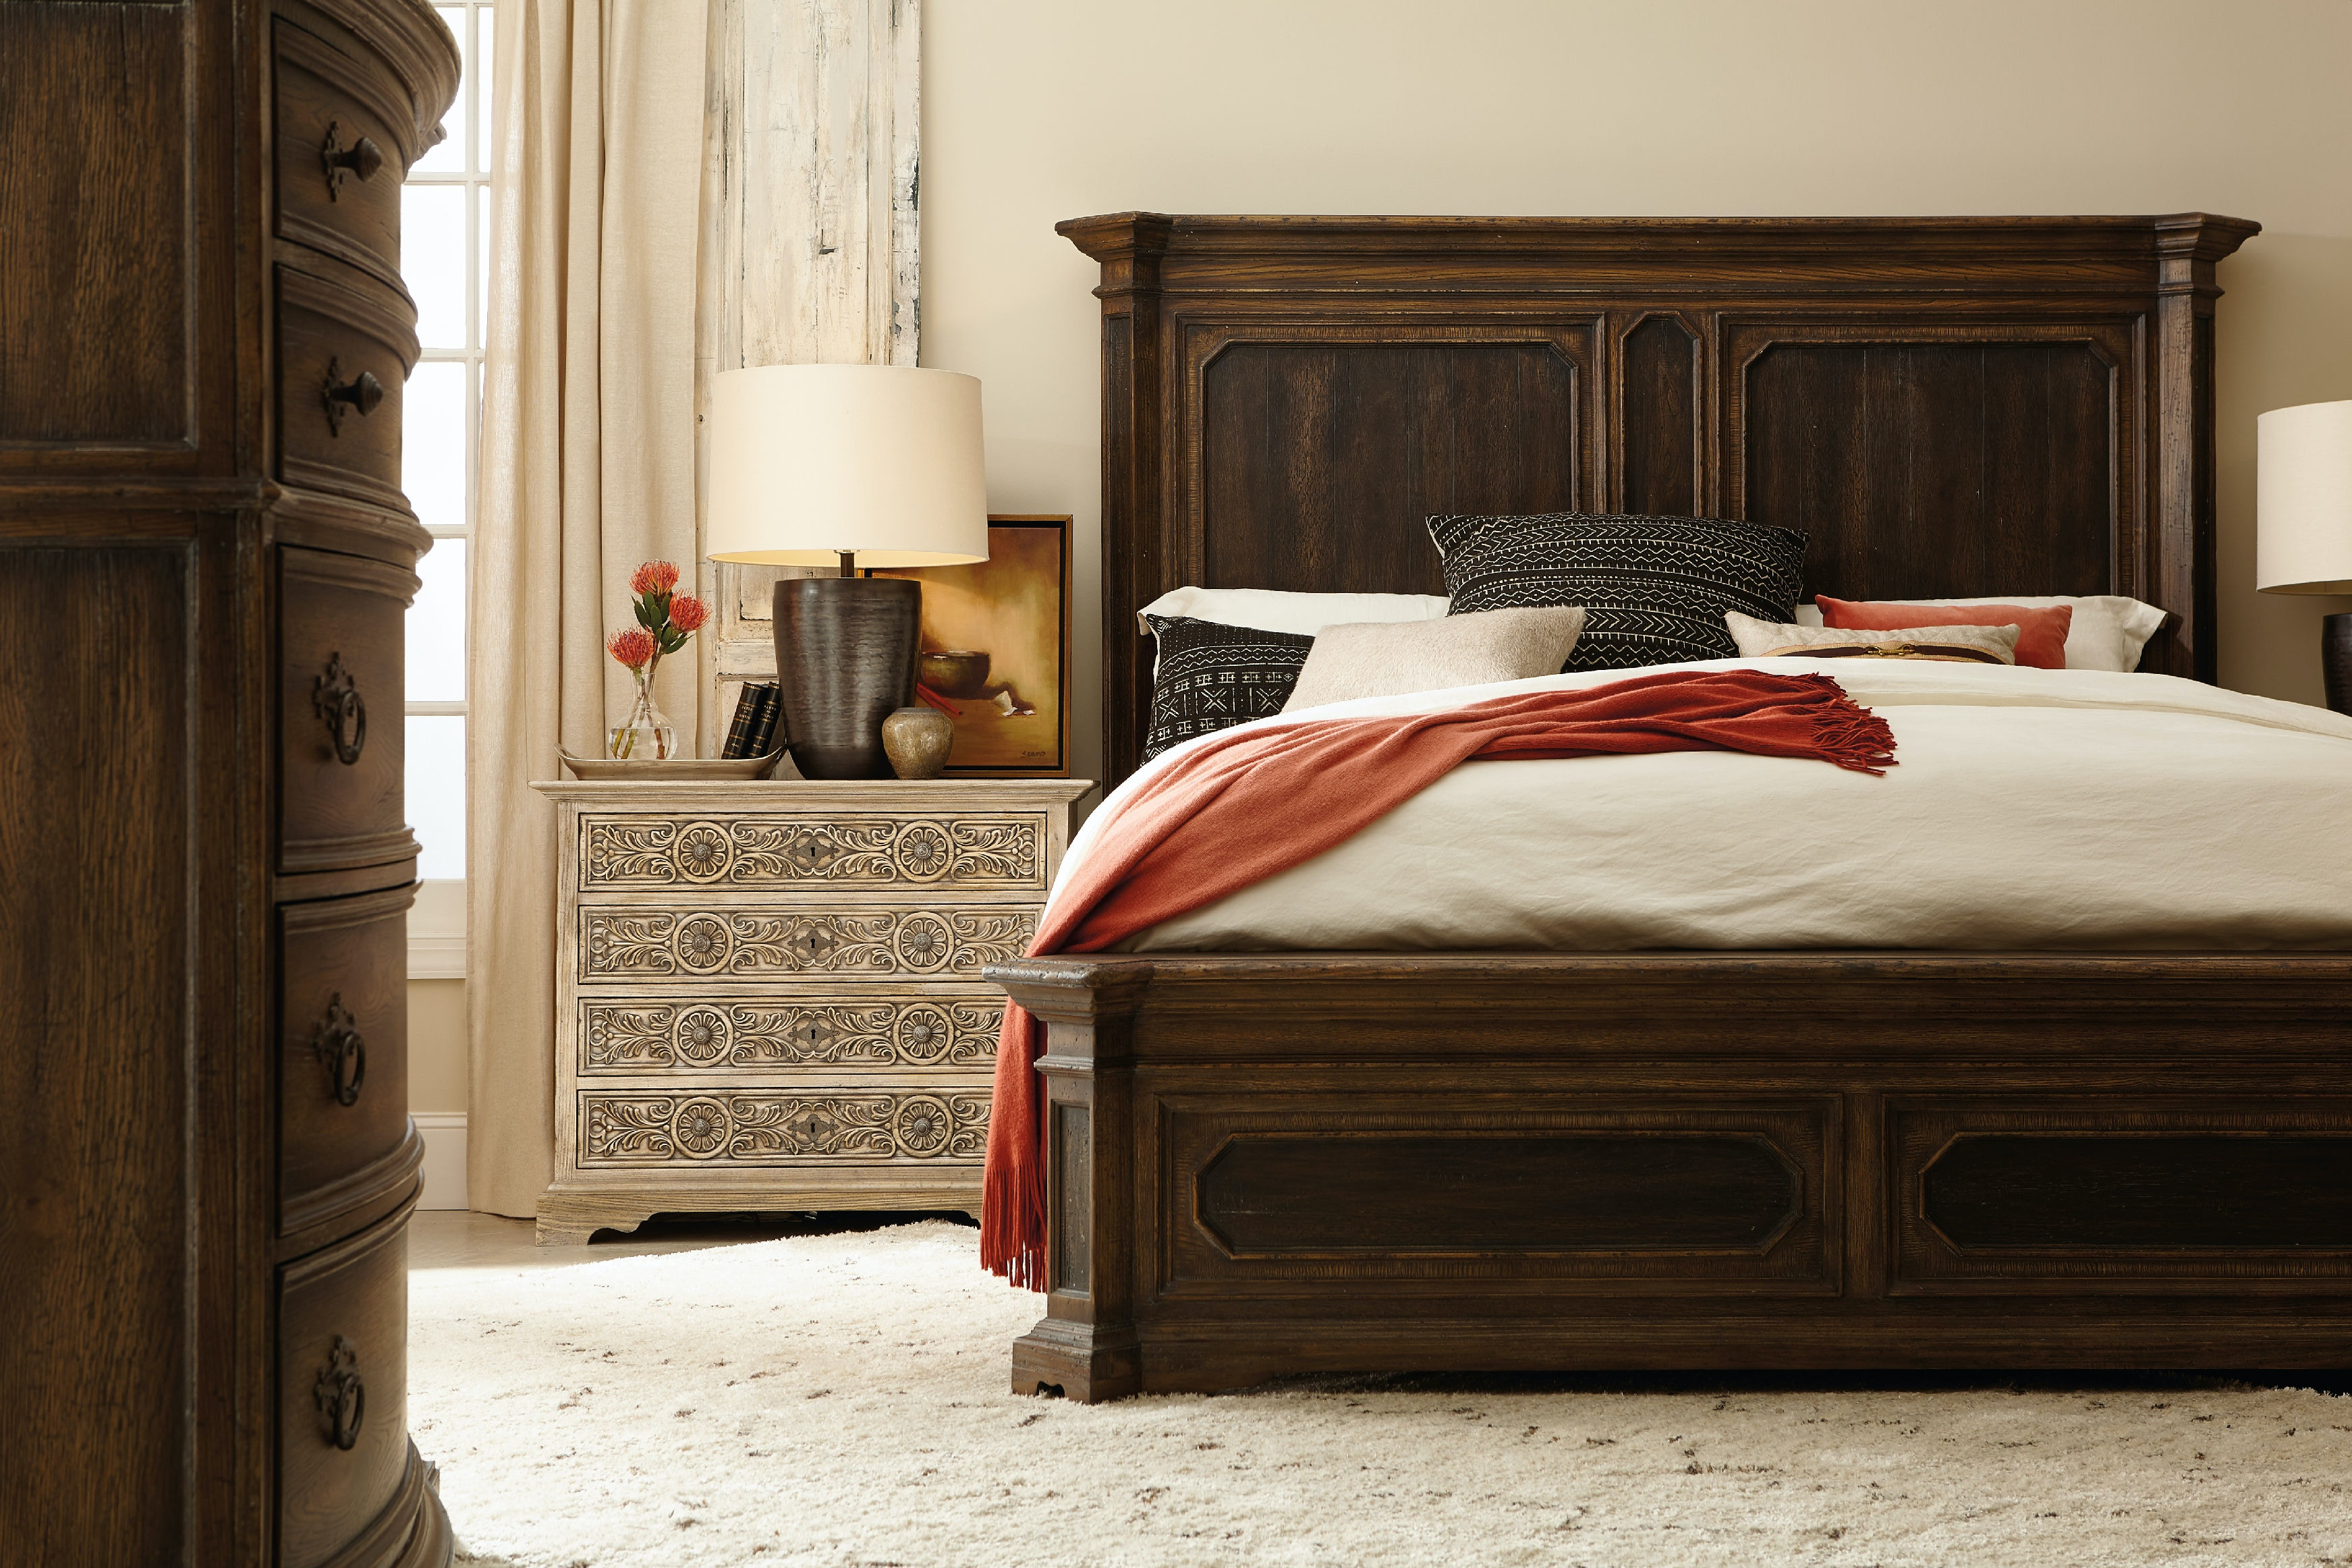 High Quality Hooker Furniture Woodcreek King Mansion Bed 5960 90266 MULTI